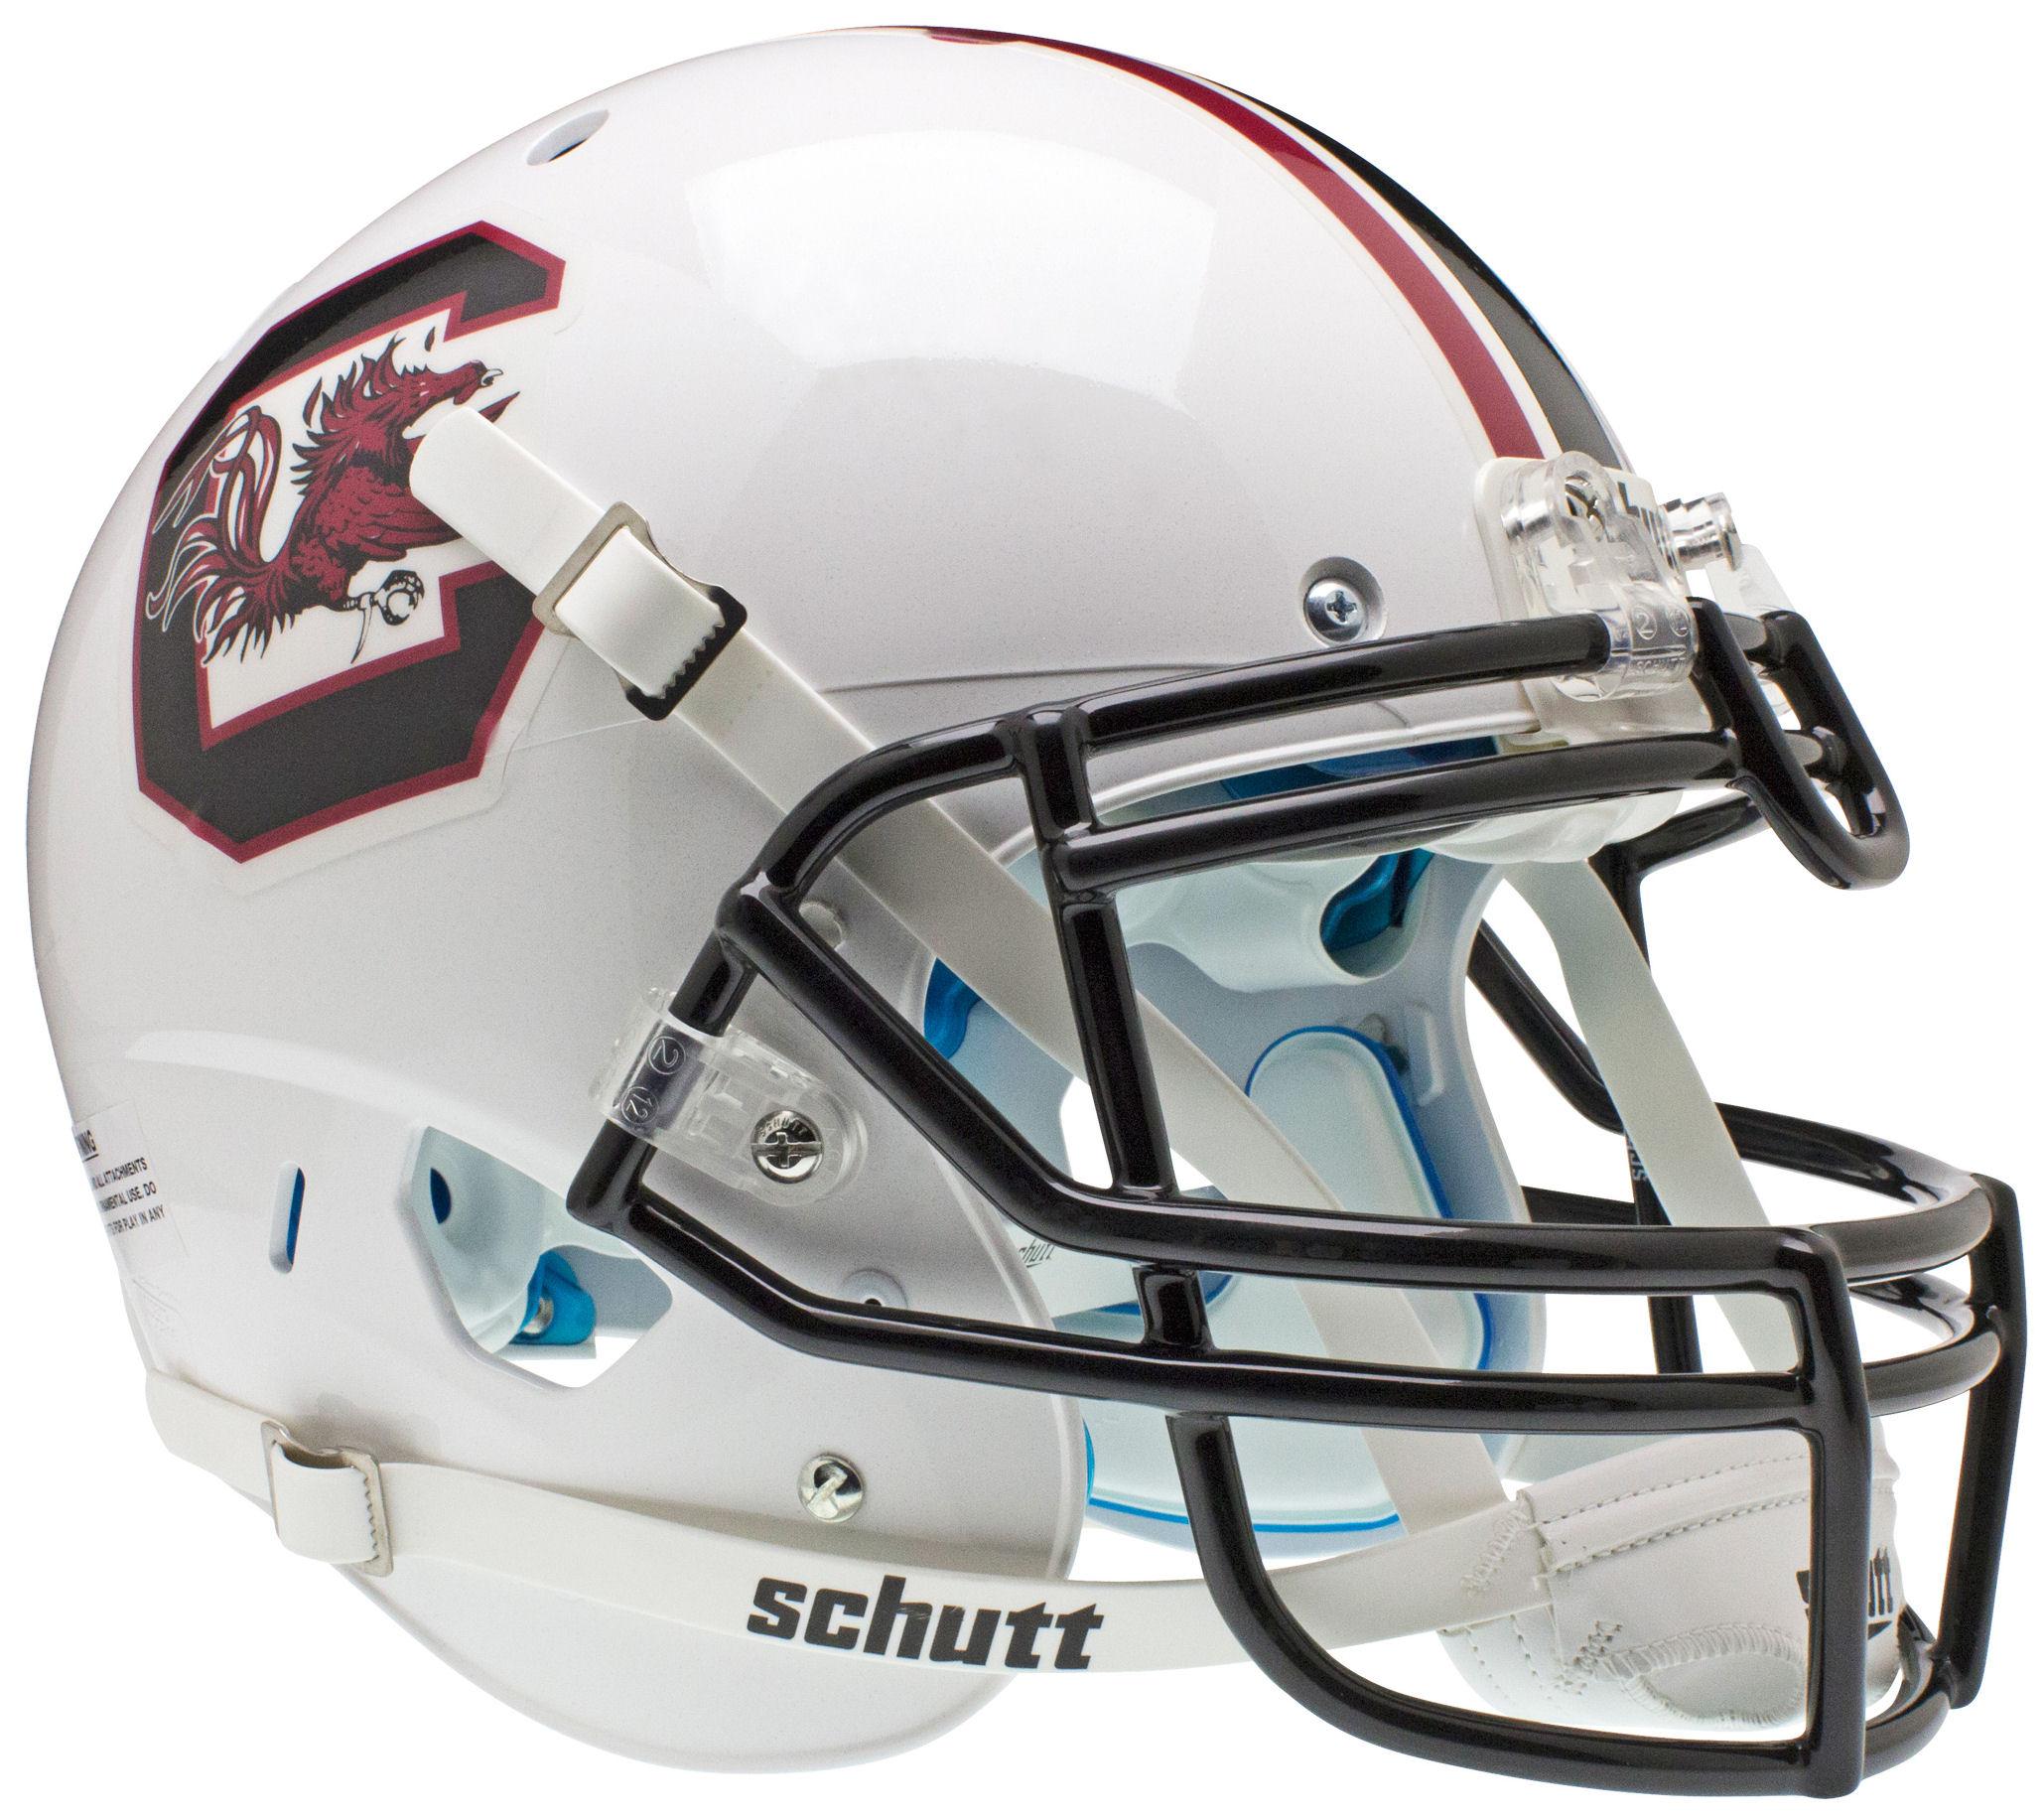 South Carolina Gamecocks Authentic College XP Football Helmet Schutt